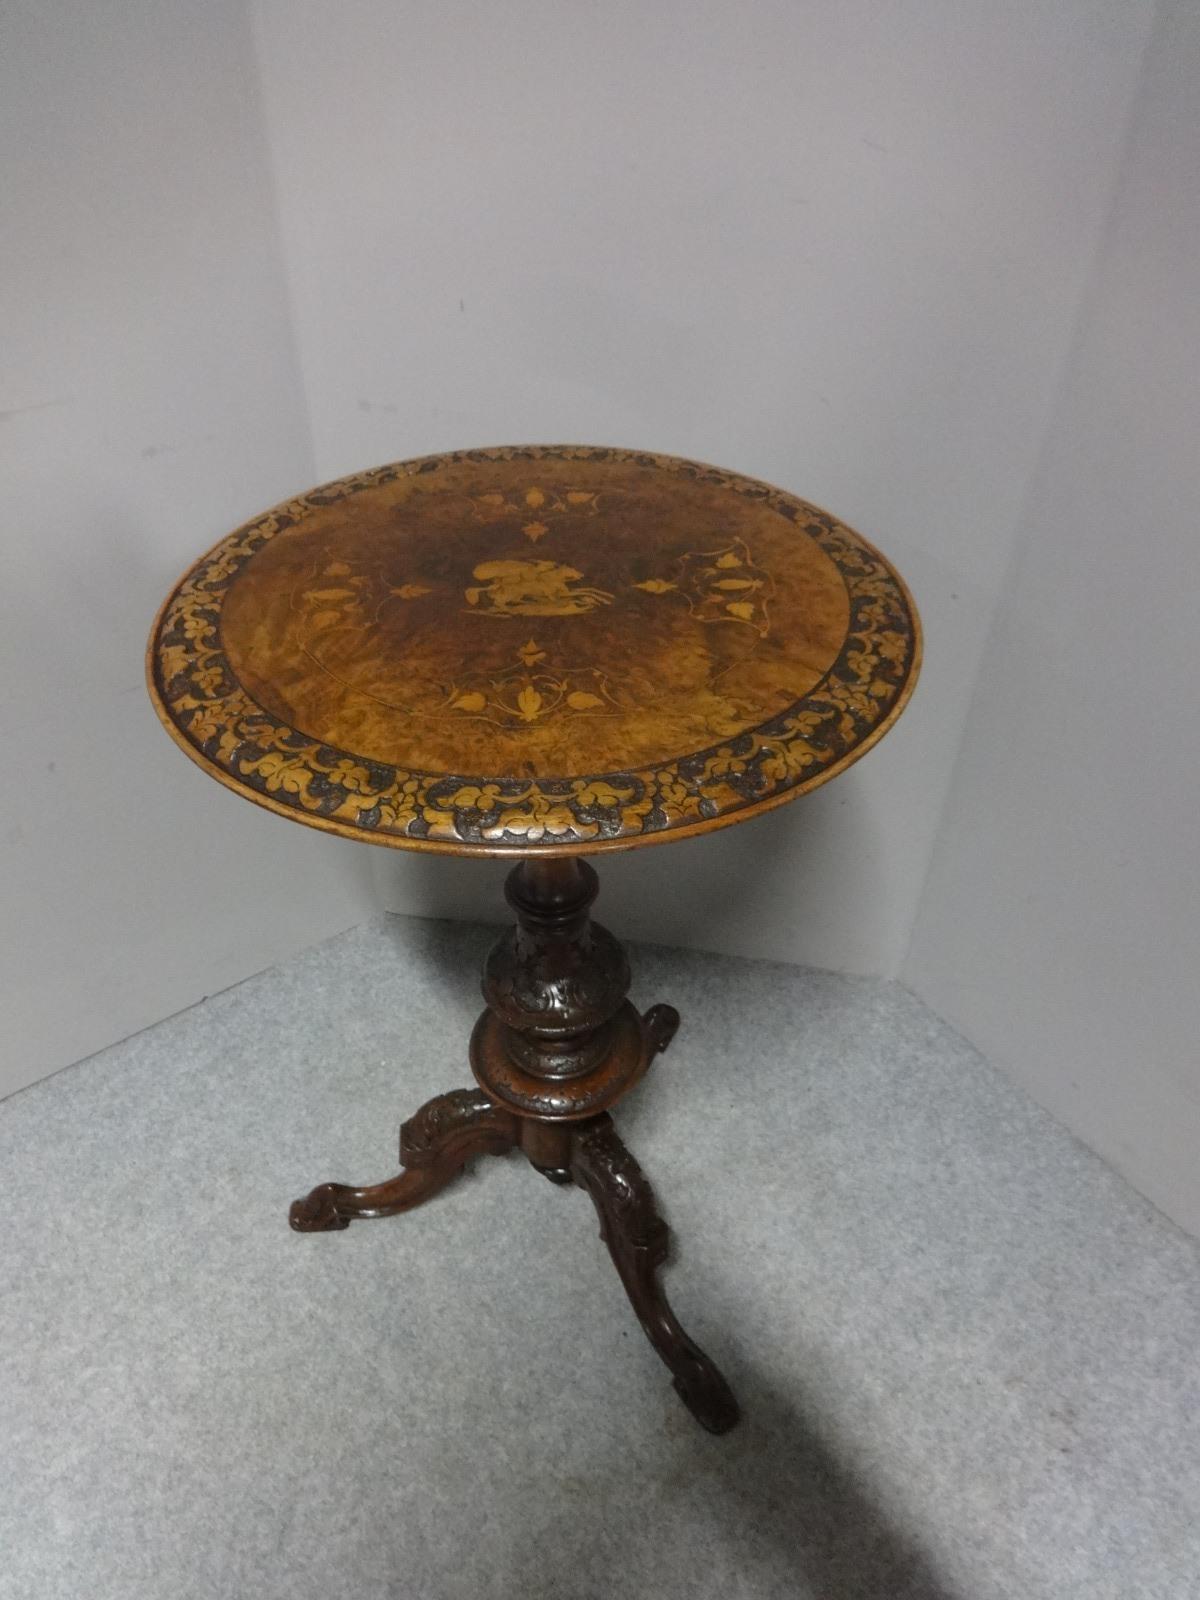 Burr Walnut Inlaid Pedestal Table c.1860 (1 of 1)